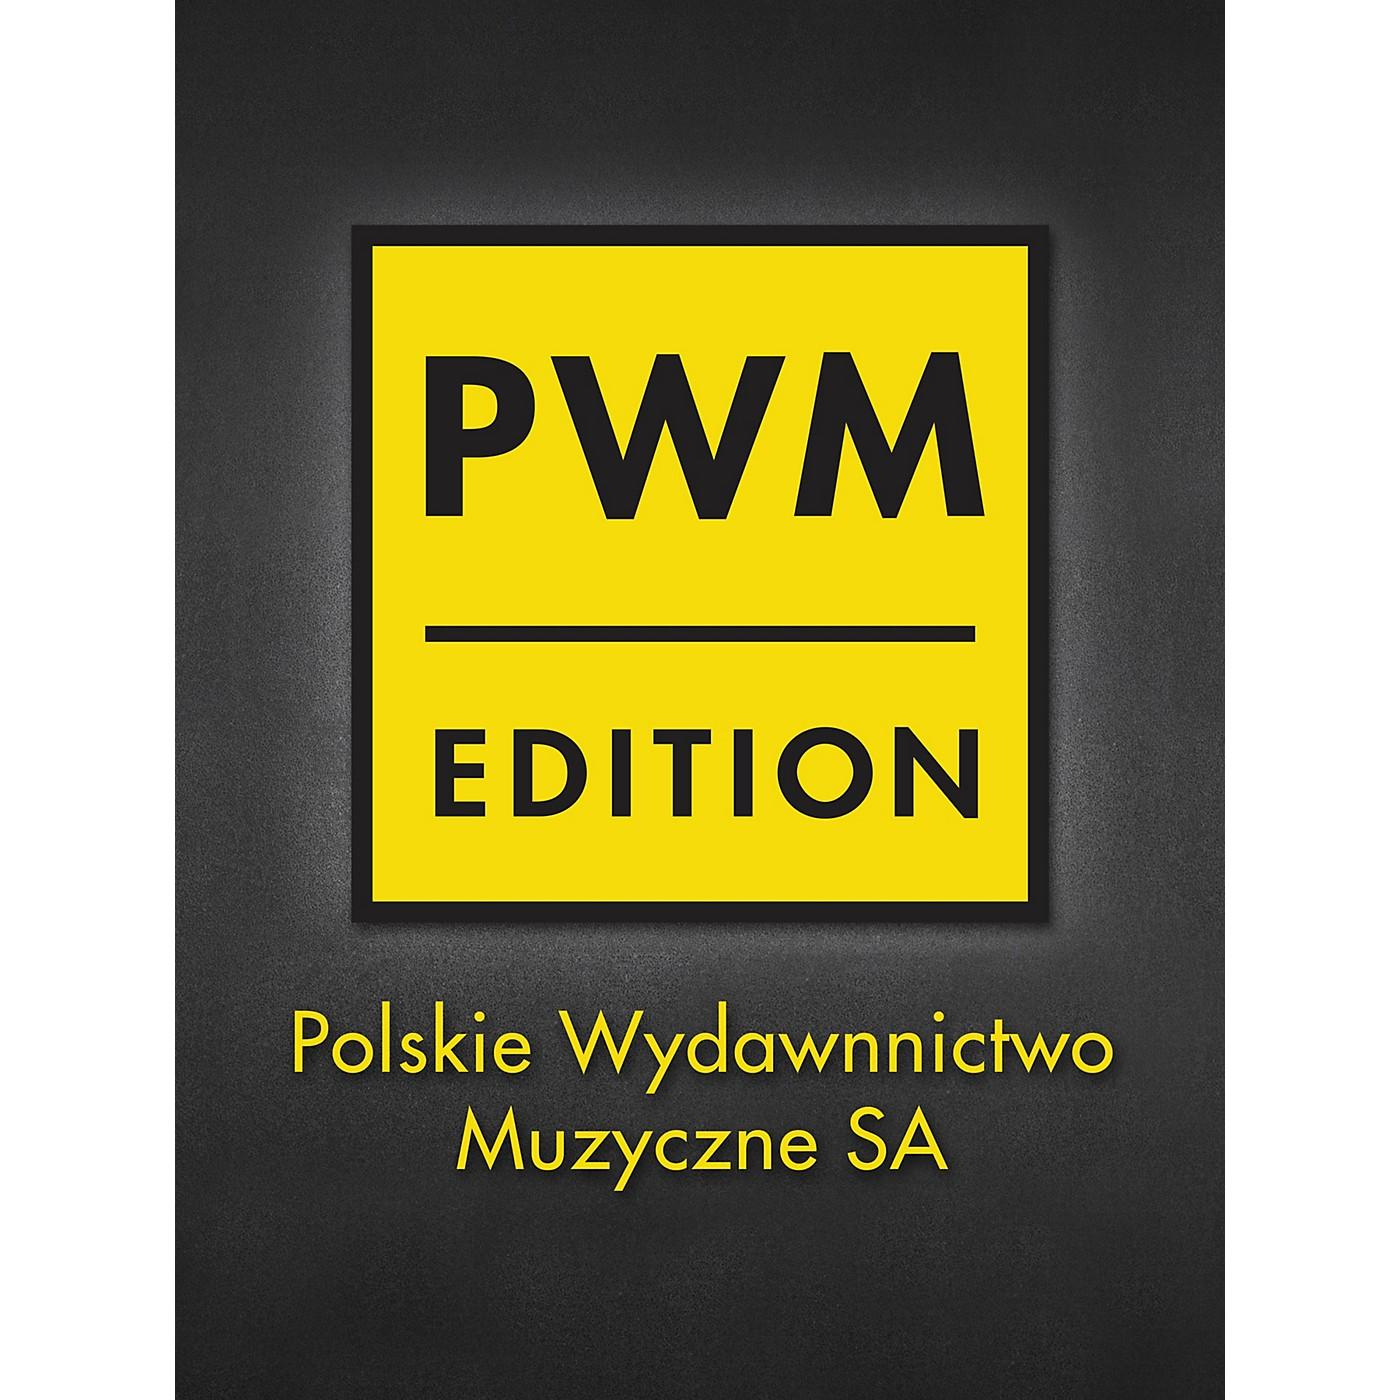 PWM Maple Leaf Rag For Guitar, Mg 16 PWM Series by S Joplin thumbnail